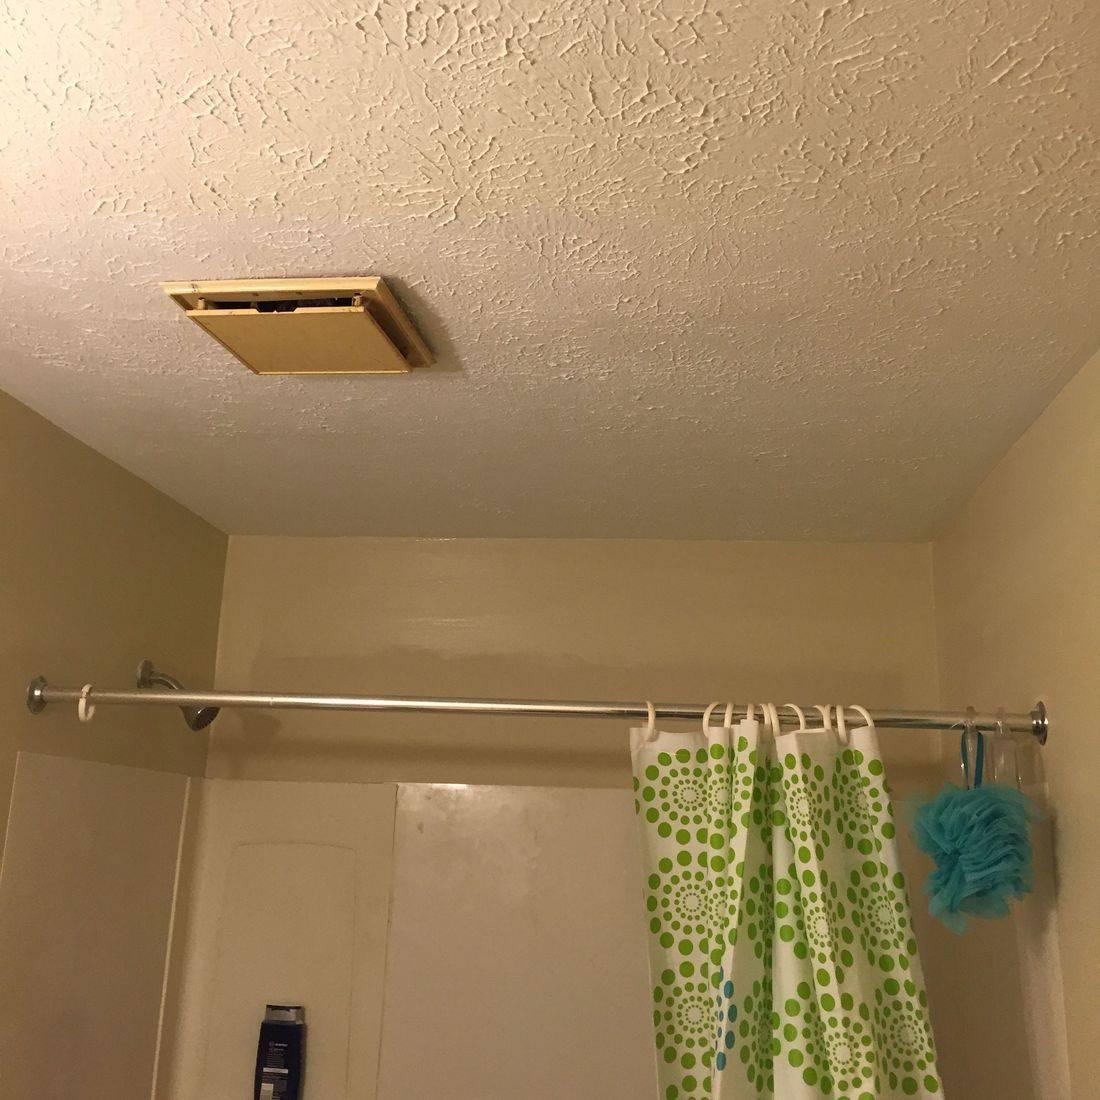 Drywall Ceiling Repair/ After